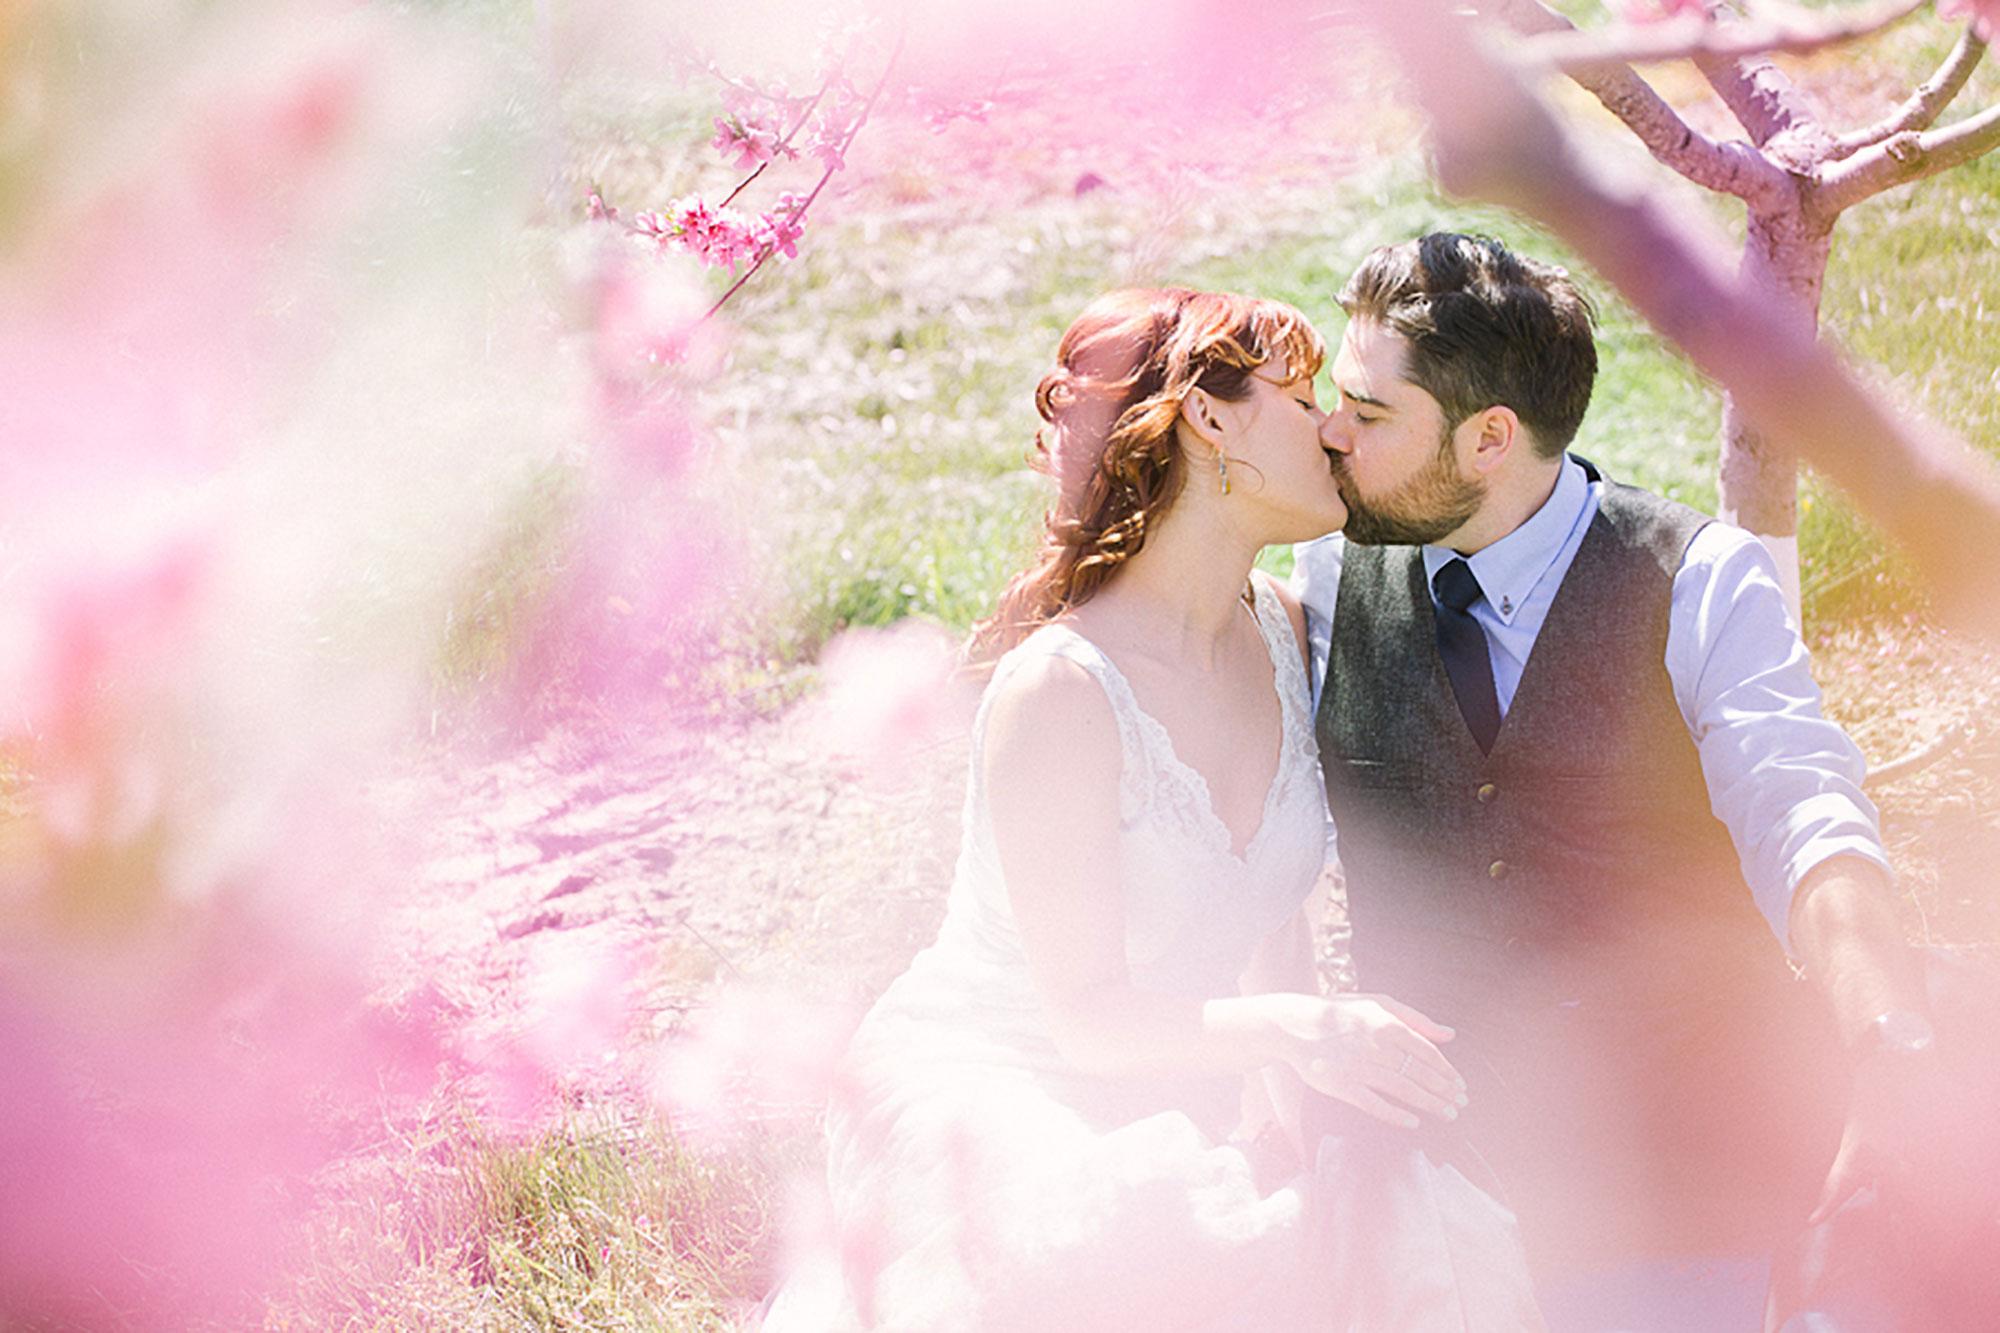 Navy-Hall-Wedding-Vineyard-Bride-Photo-By-Andrew-Mark-Photography-026.jpg